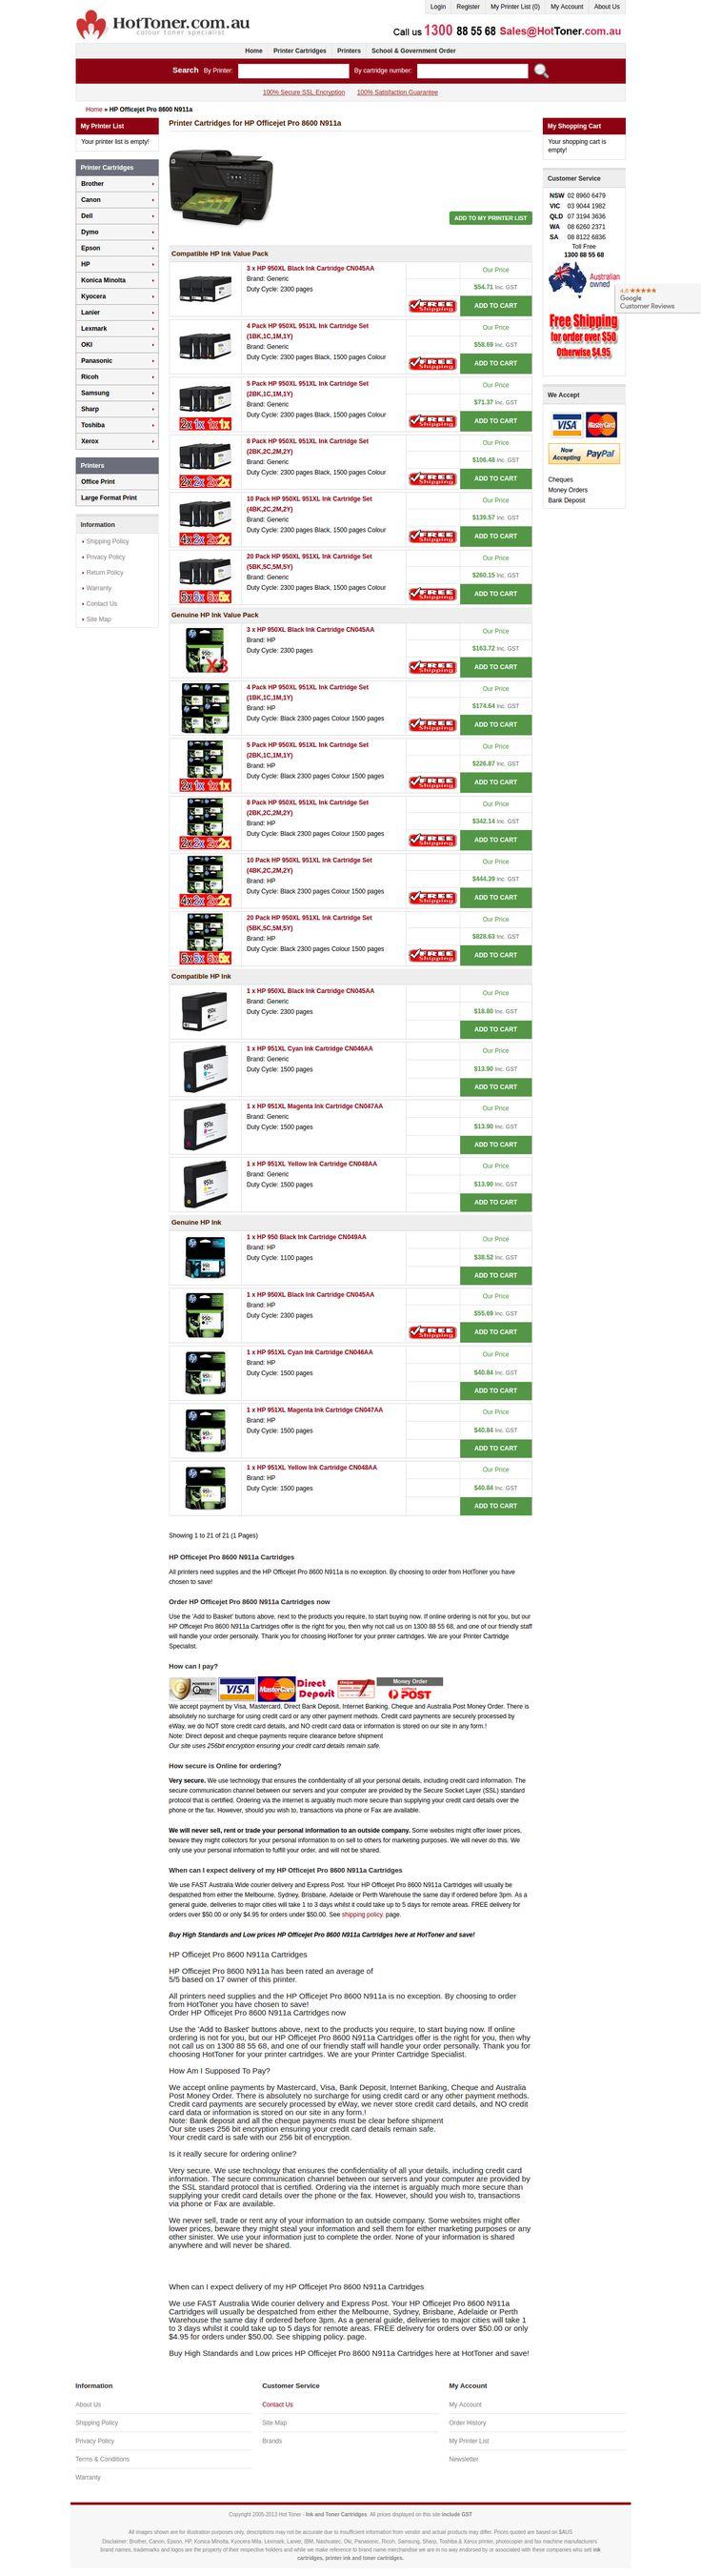 Printer Cartridges for HP Officejet Pro 8600 N911a available at Hot Toner  #ink #cartridges #hp #officejet #printer #printing #gadgets #sydney #australia